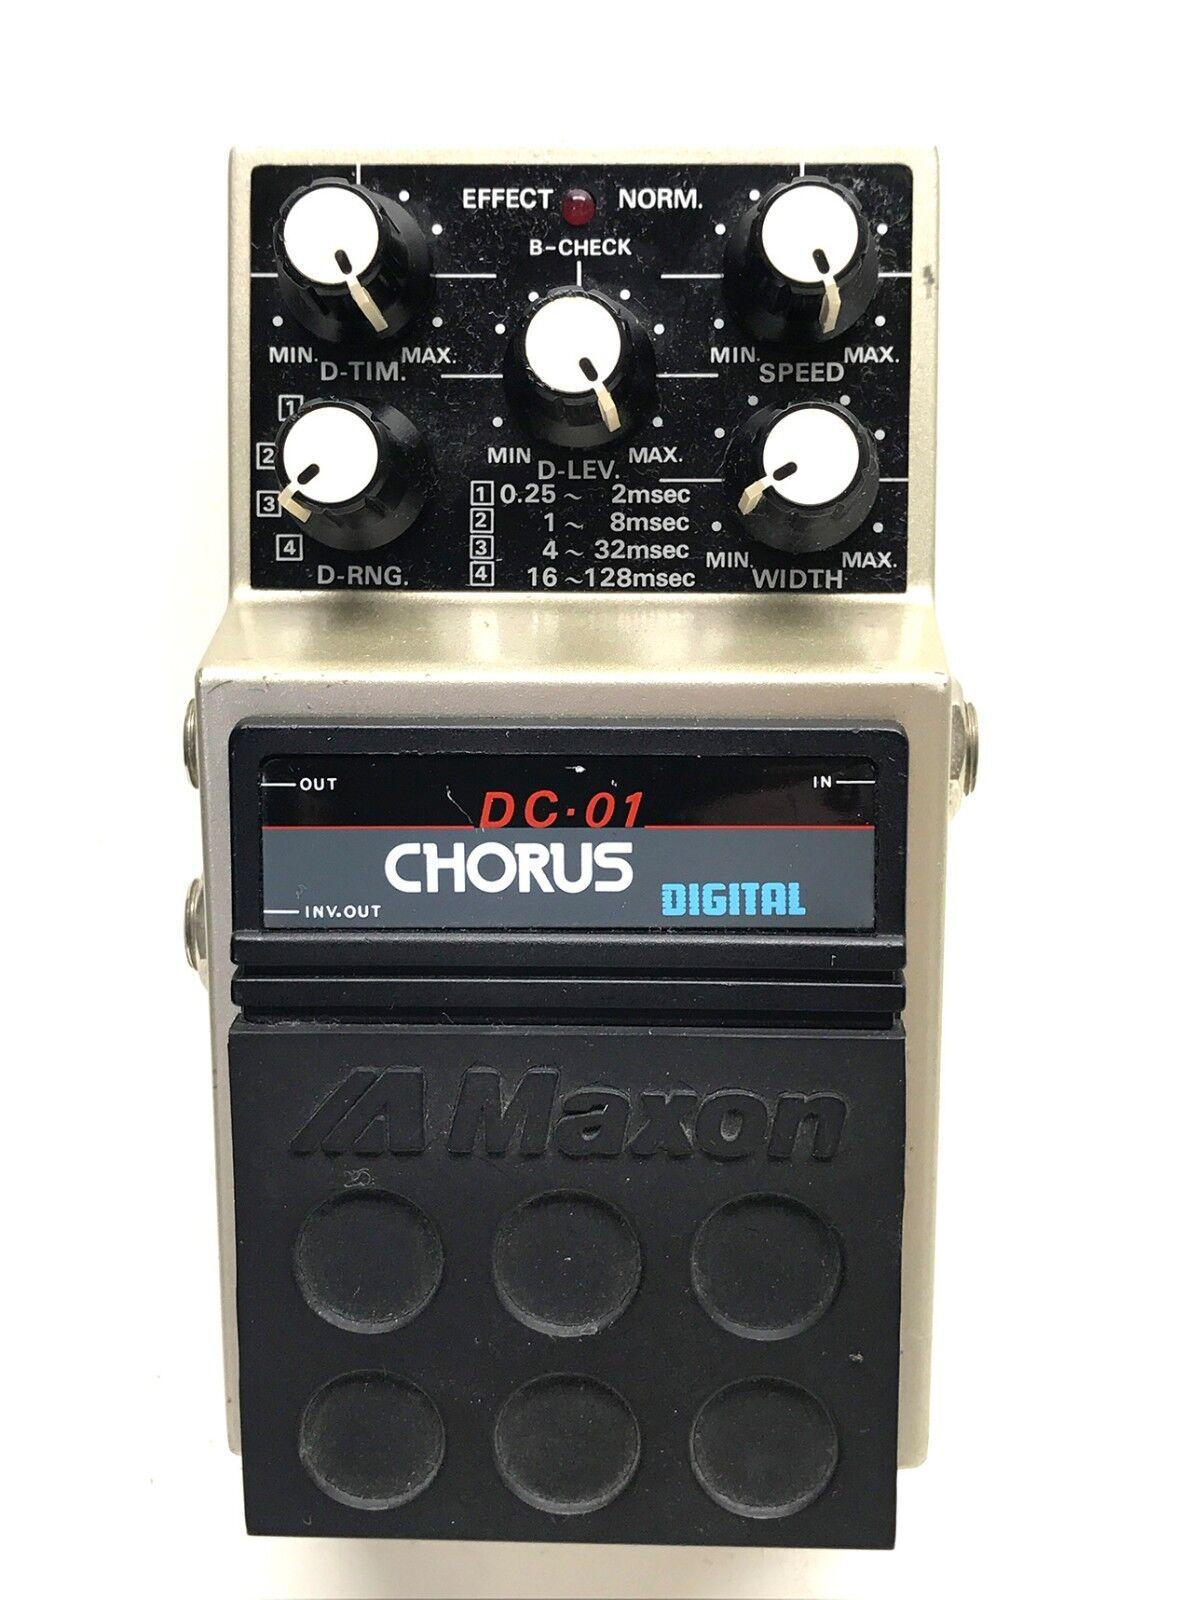 Maxon DC-01, Digital Chorus, Made In Japan, 1980's, Guitar Effect Pedal